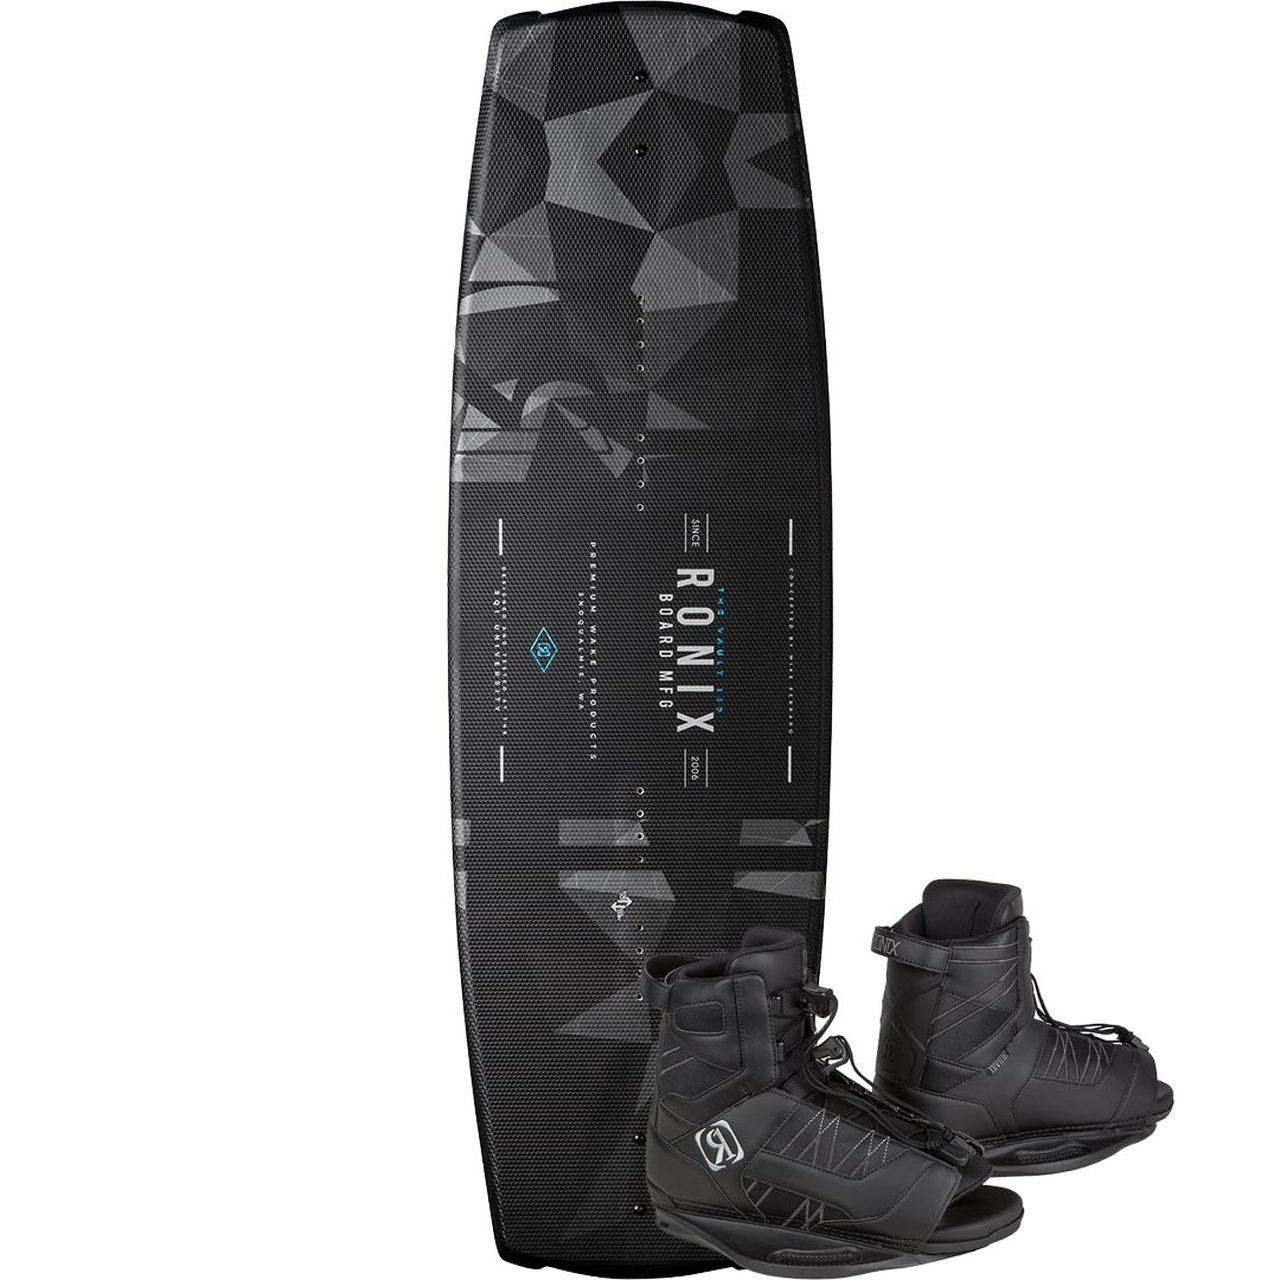 Ronix Vault 134 Combo w/ Divide 7.5-11.5 Boots